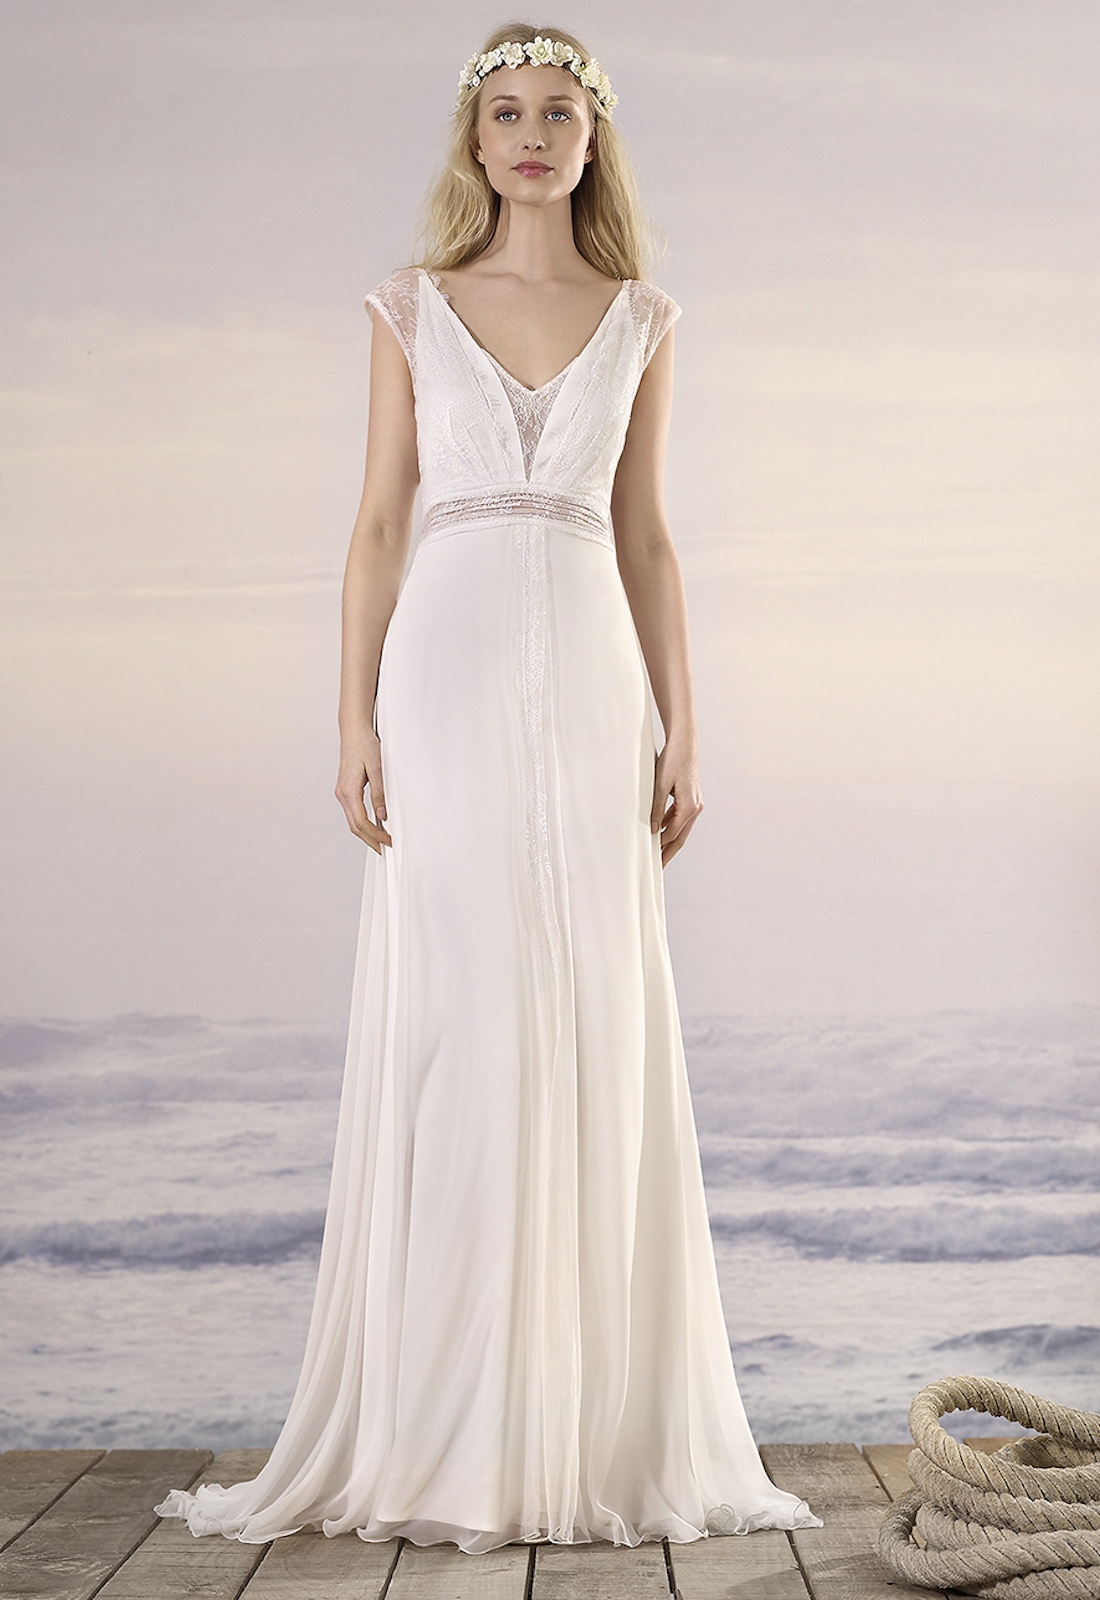 Robe De Mariee Boheme Eve Marylise Caralys Mariage Nice 06